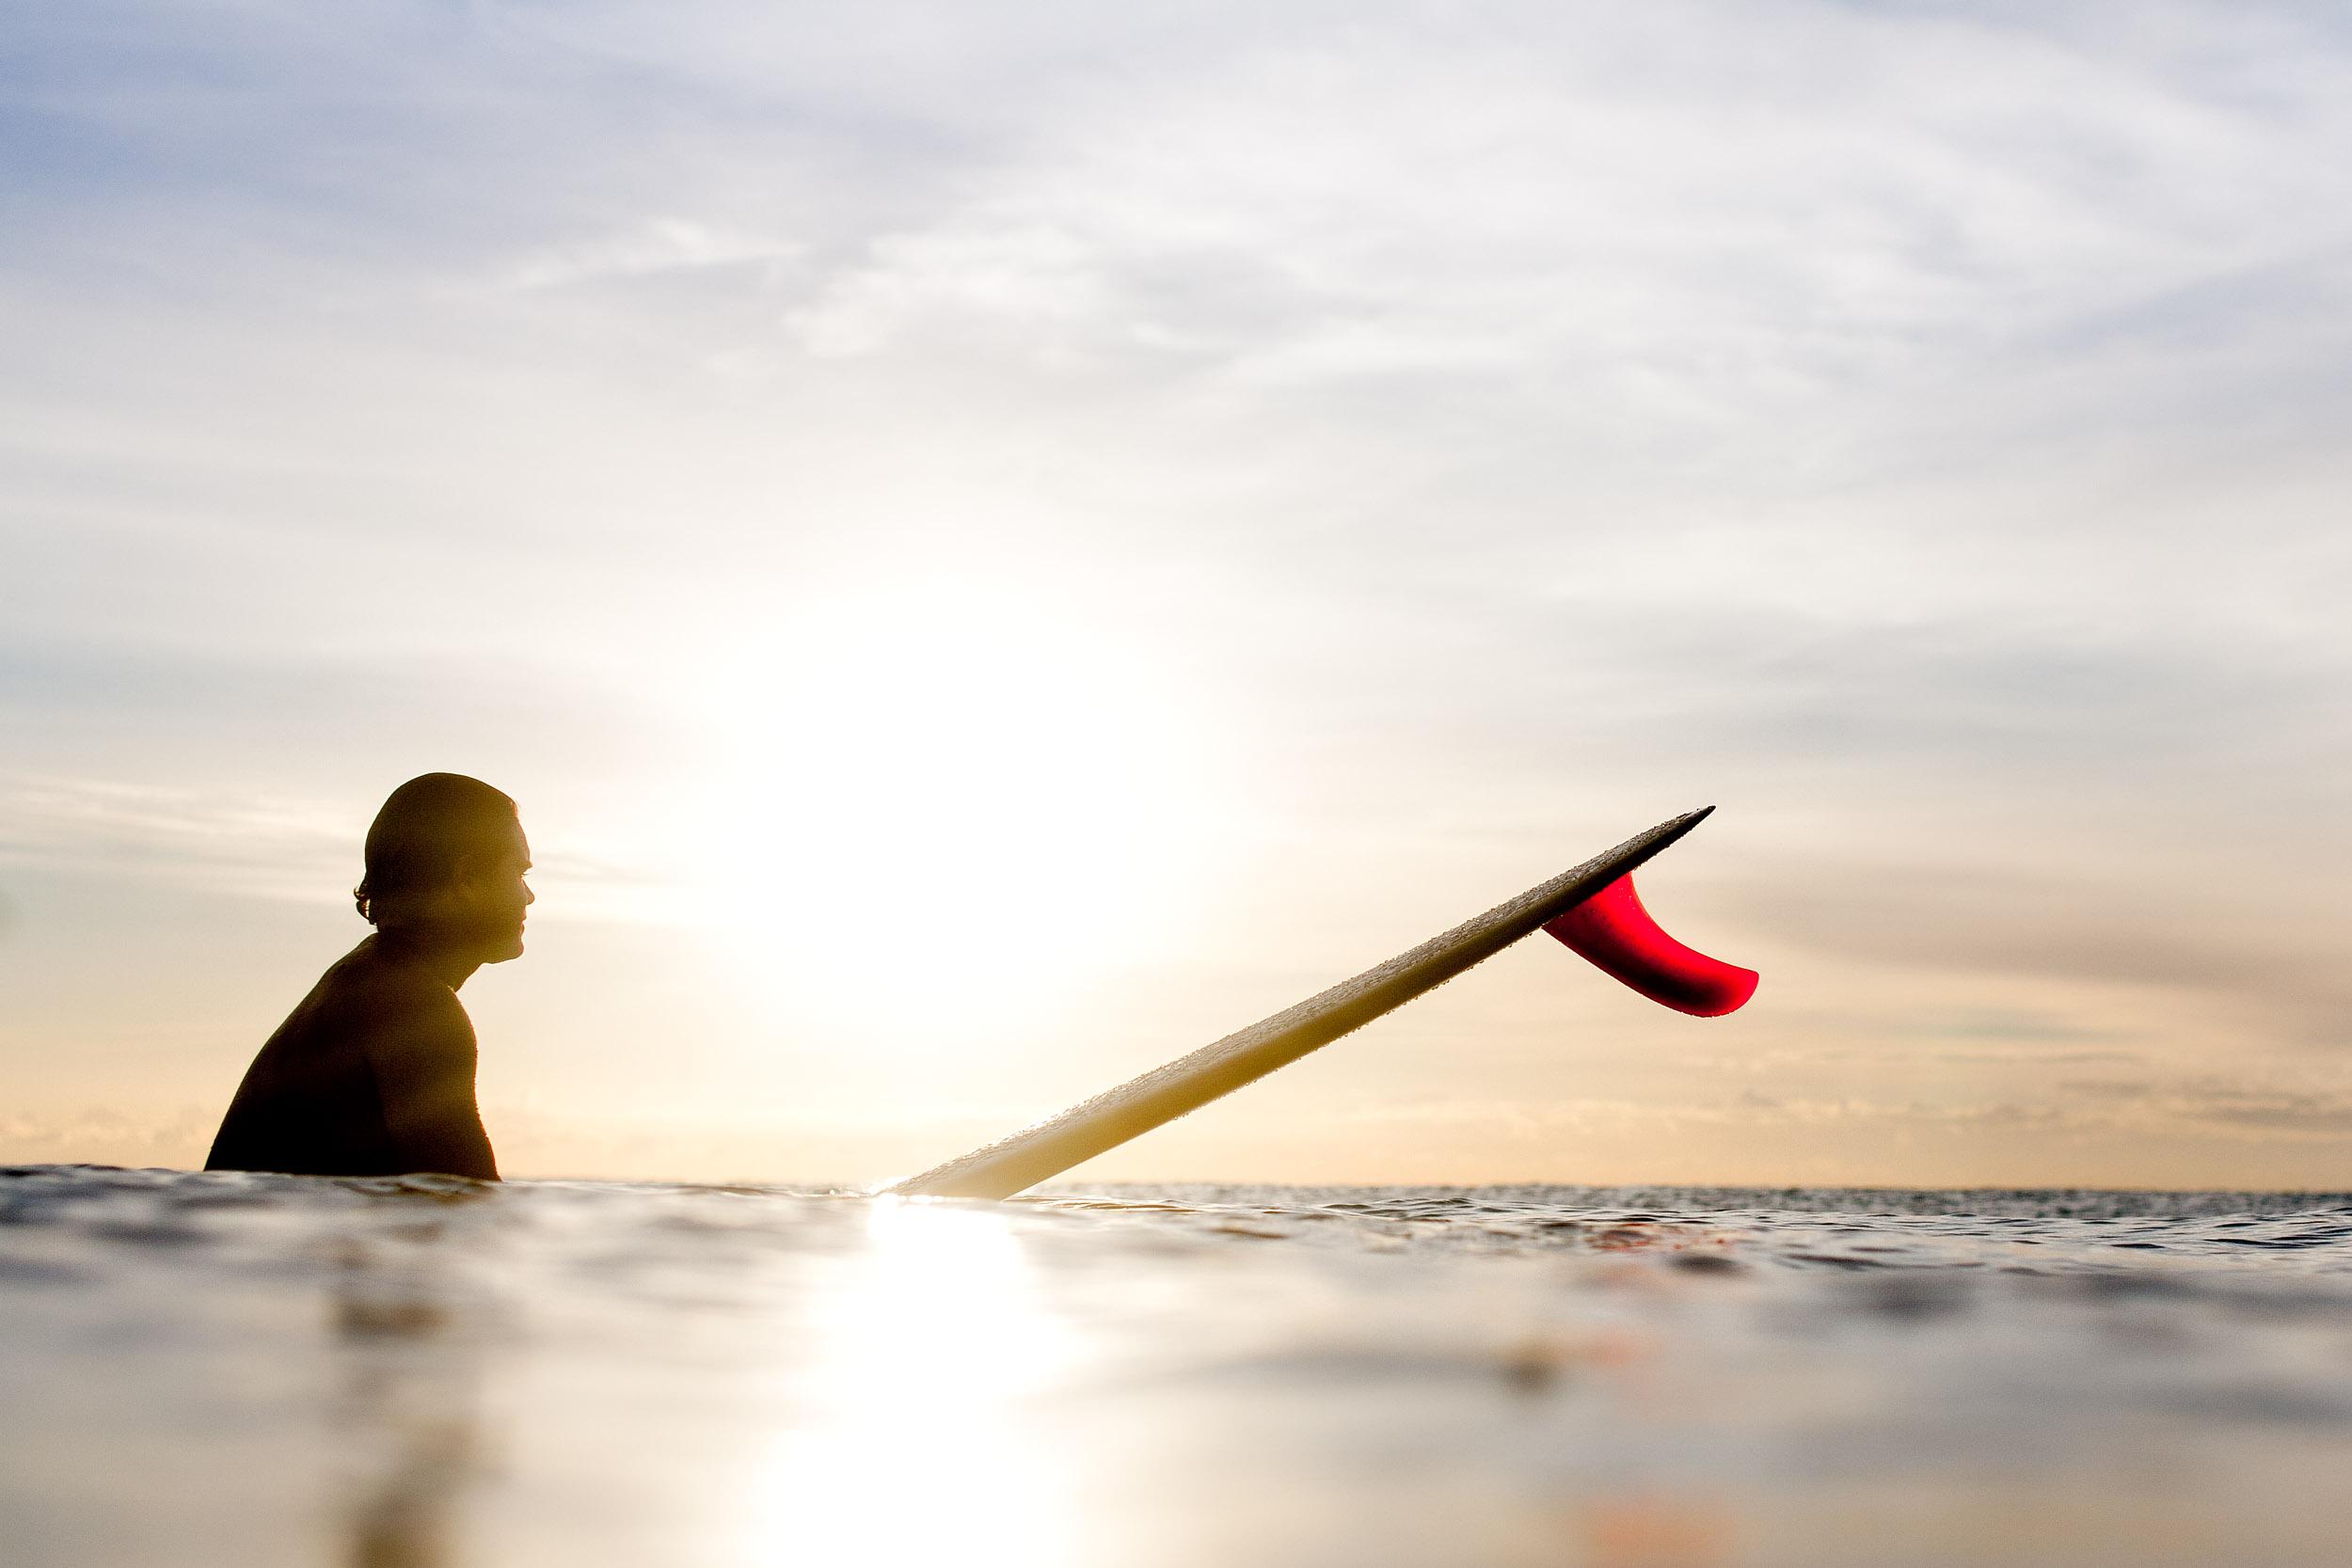 longboard-surf-lifestyle-S1367-301.jpg